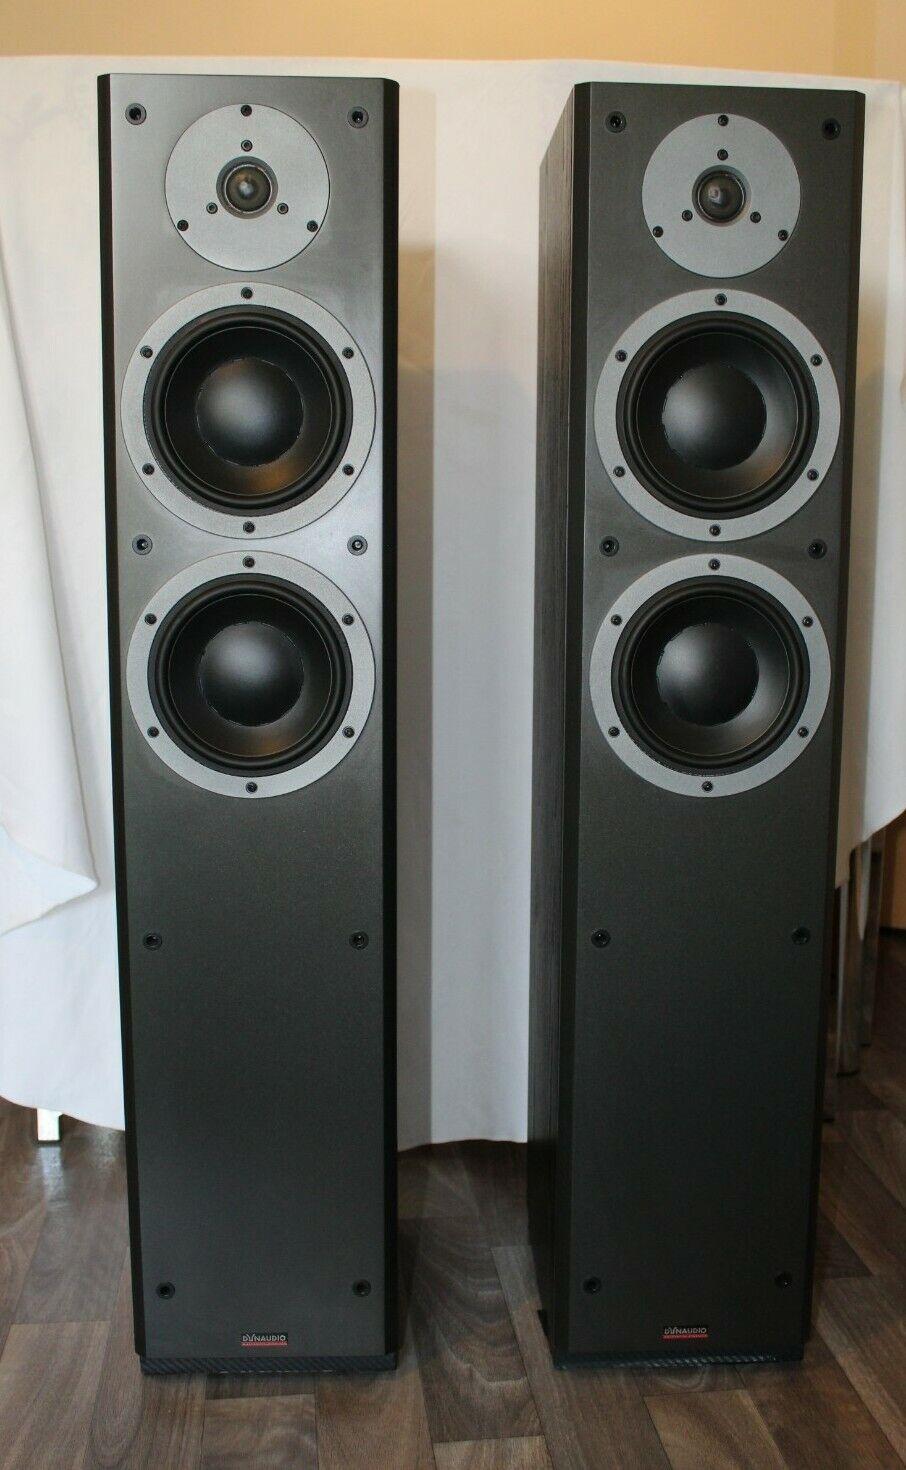 Dynaudio DM 3/7 Floorstanding Speakers Black - Made in Denmark